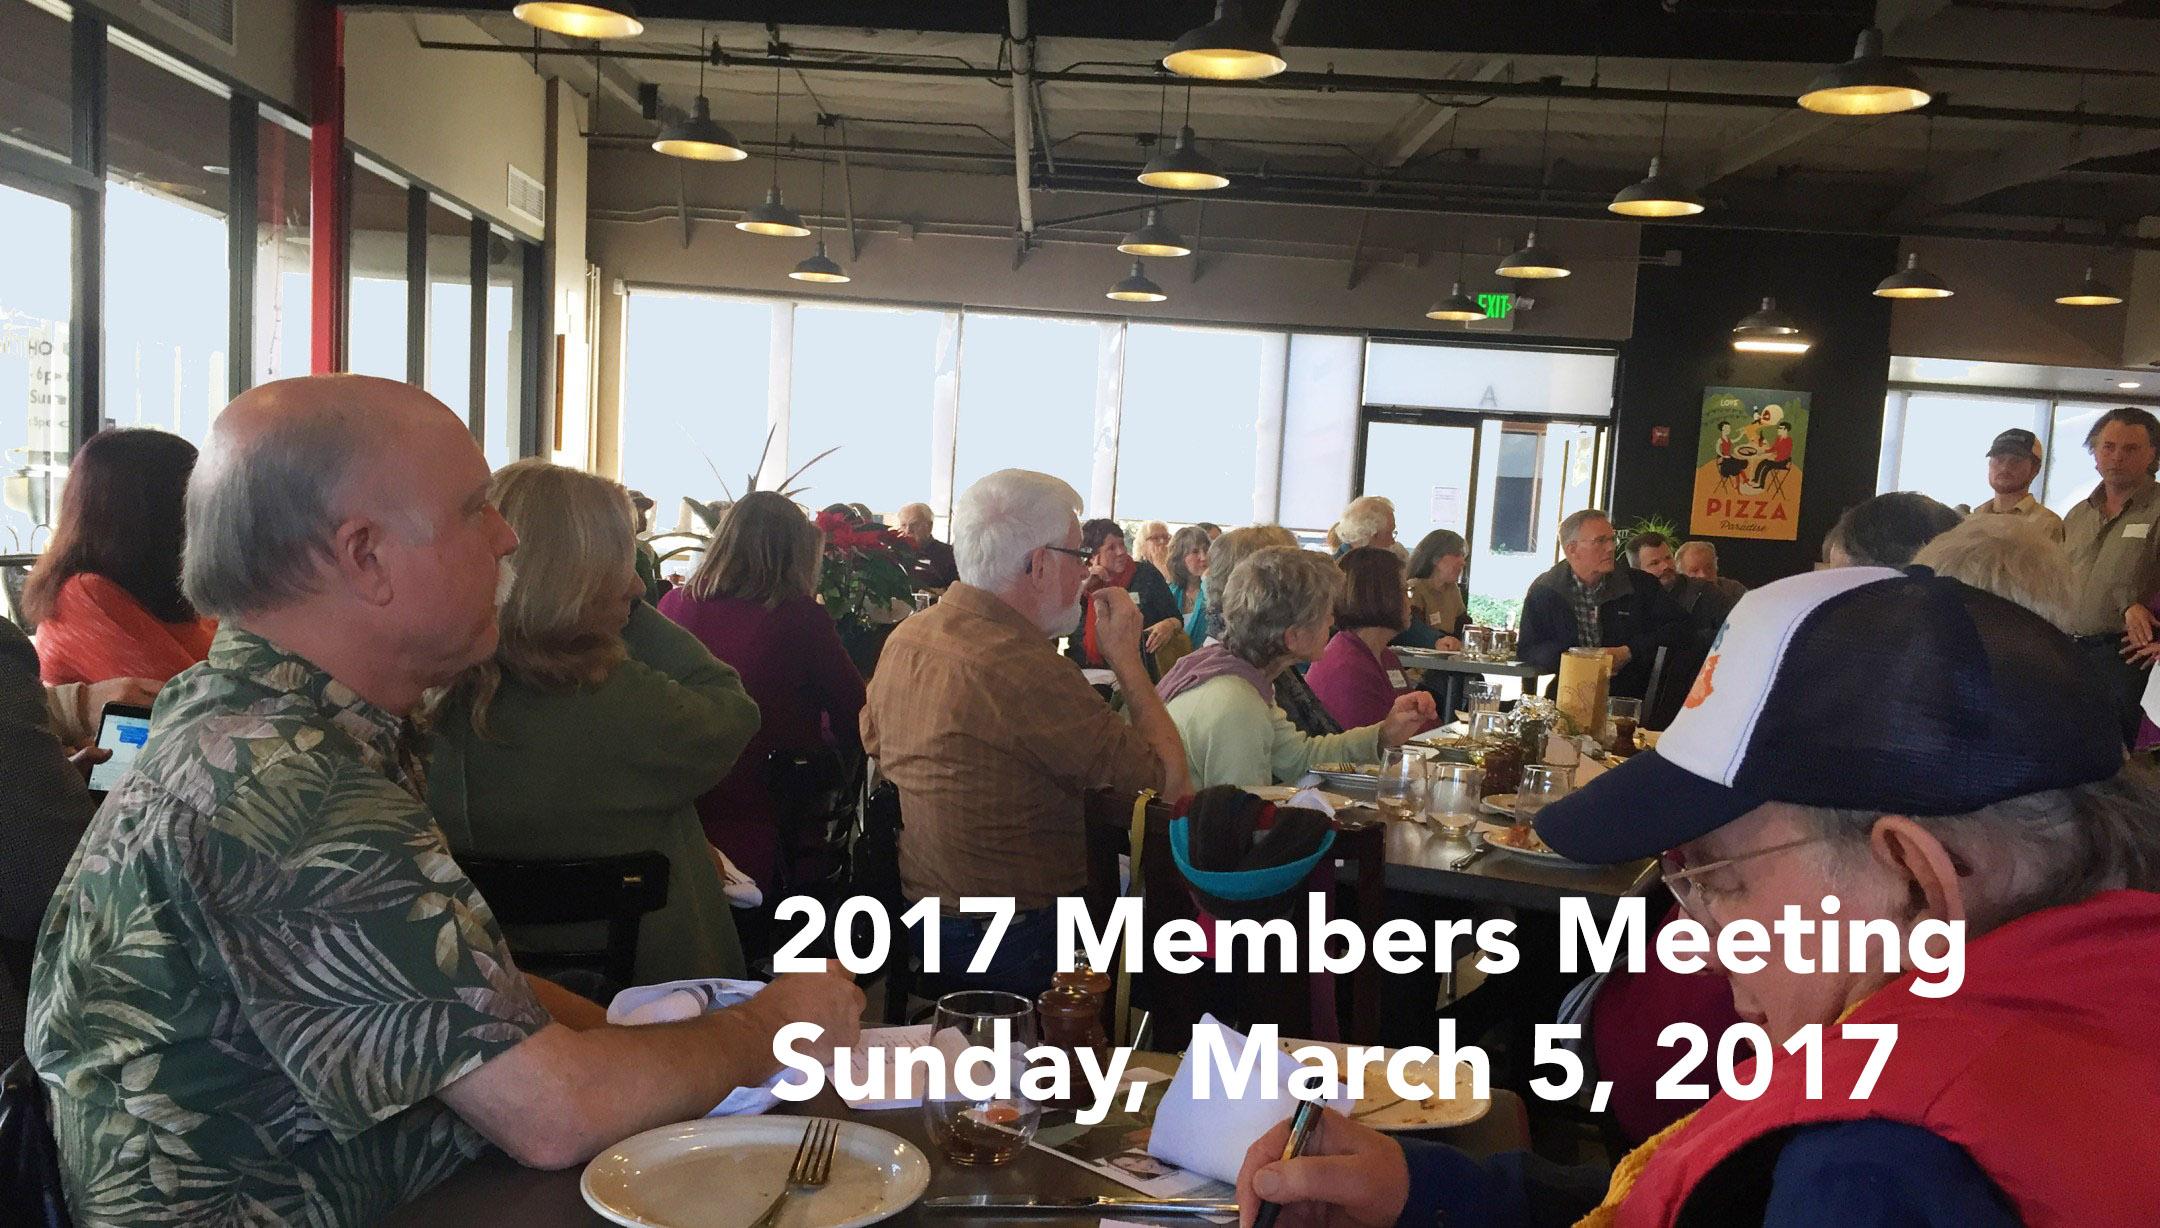 2017 Annual Members Meeting